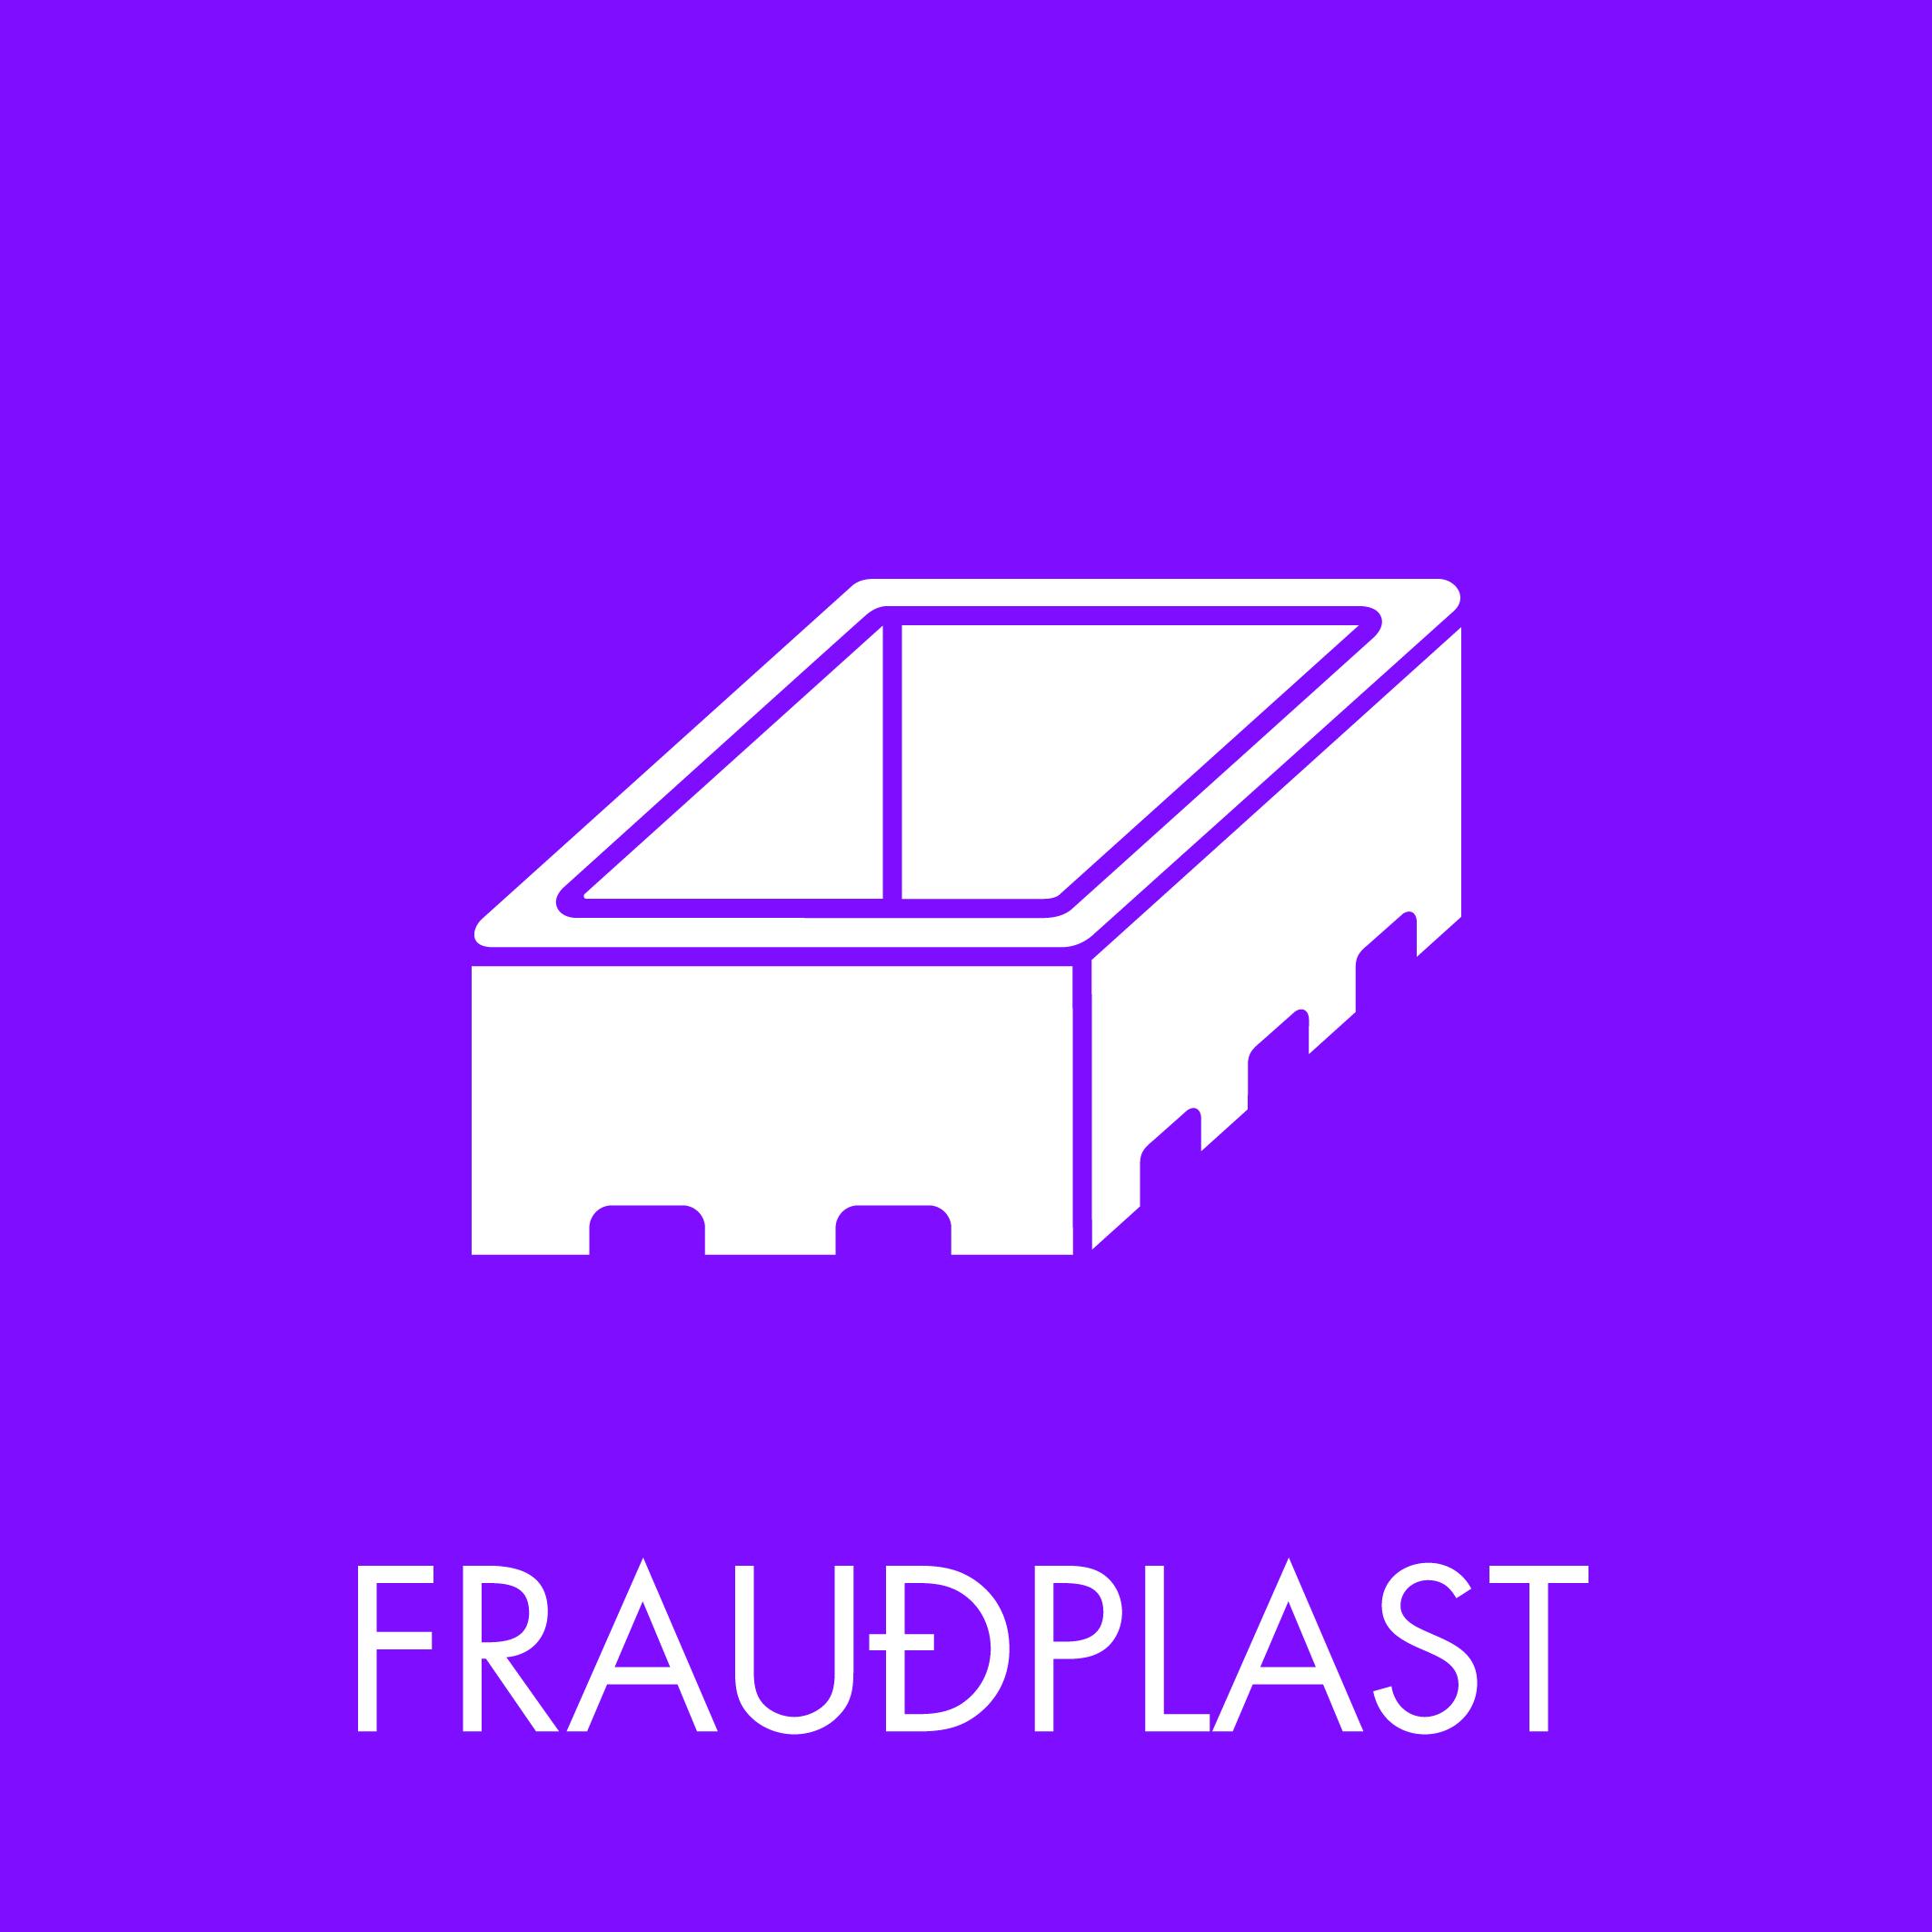 Frauðplast